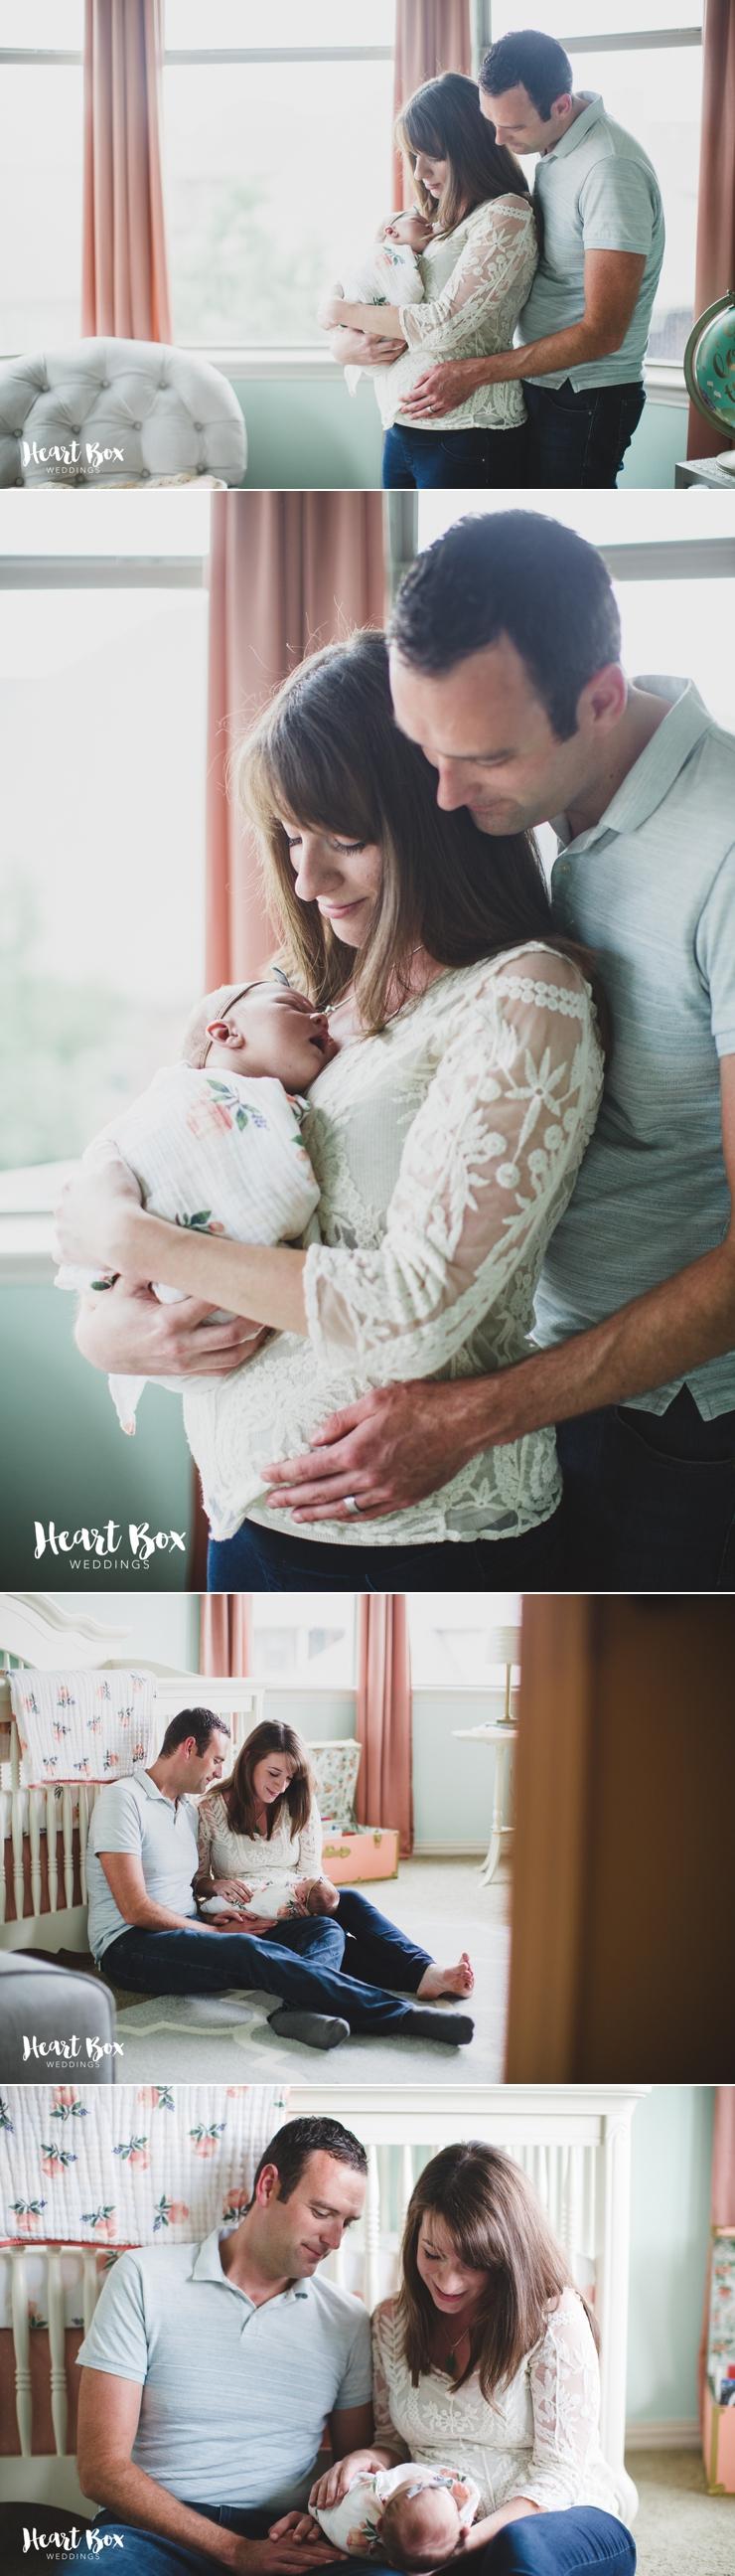 Emma Jackson Newborn Blog Collages 2.jpg